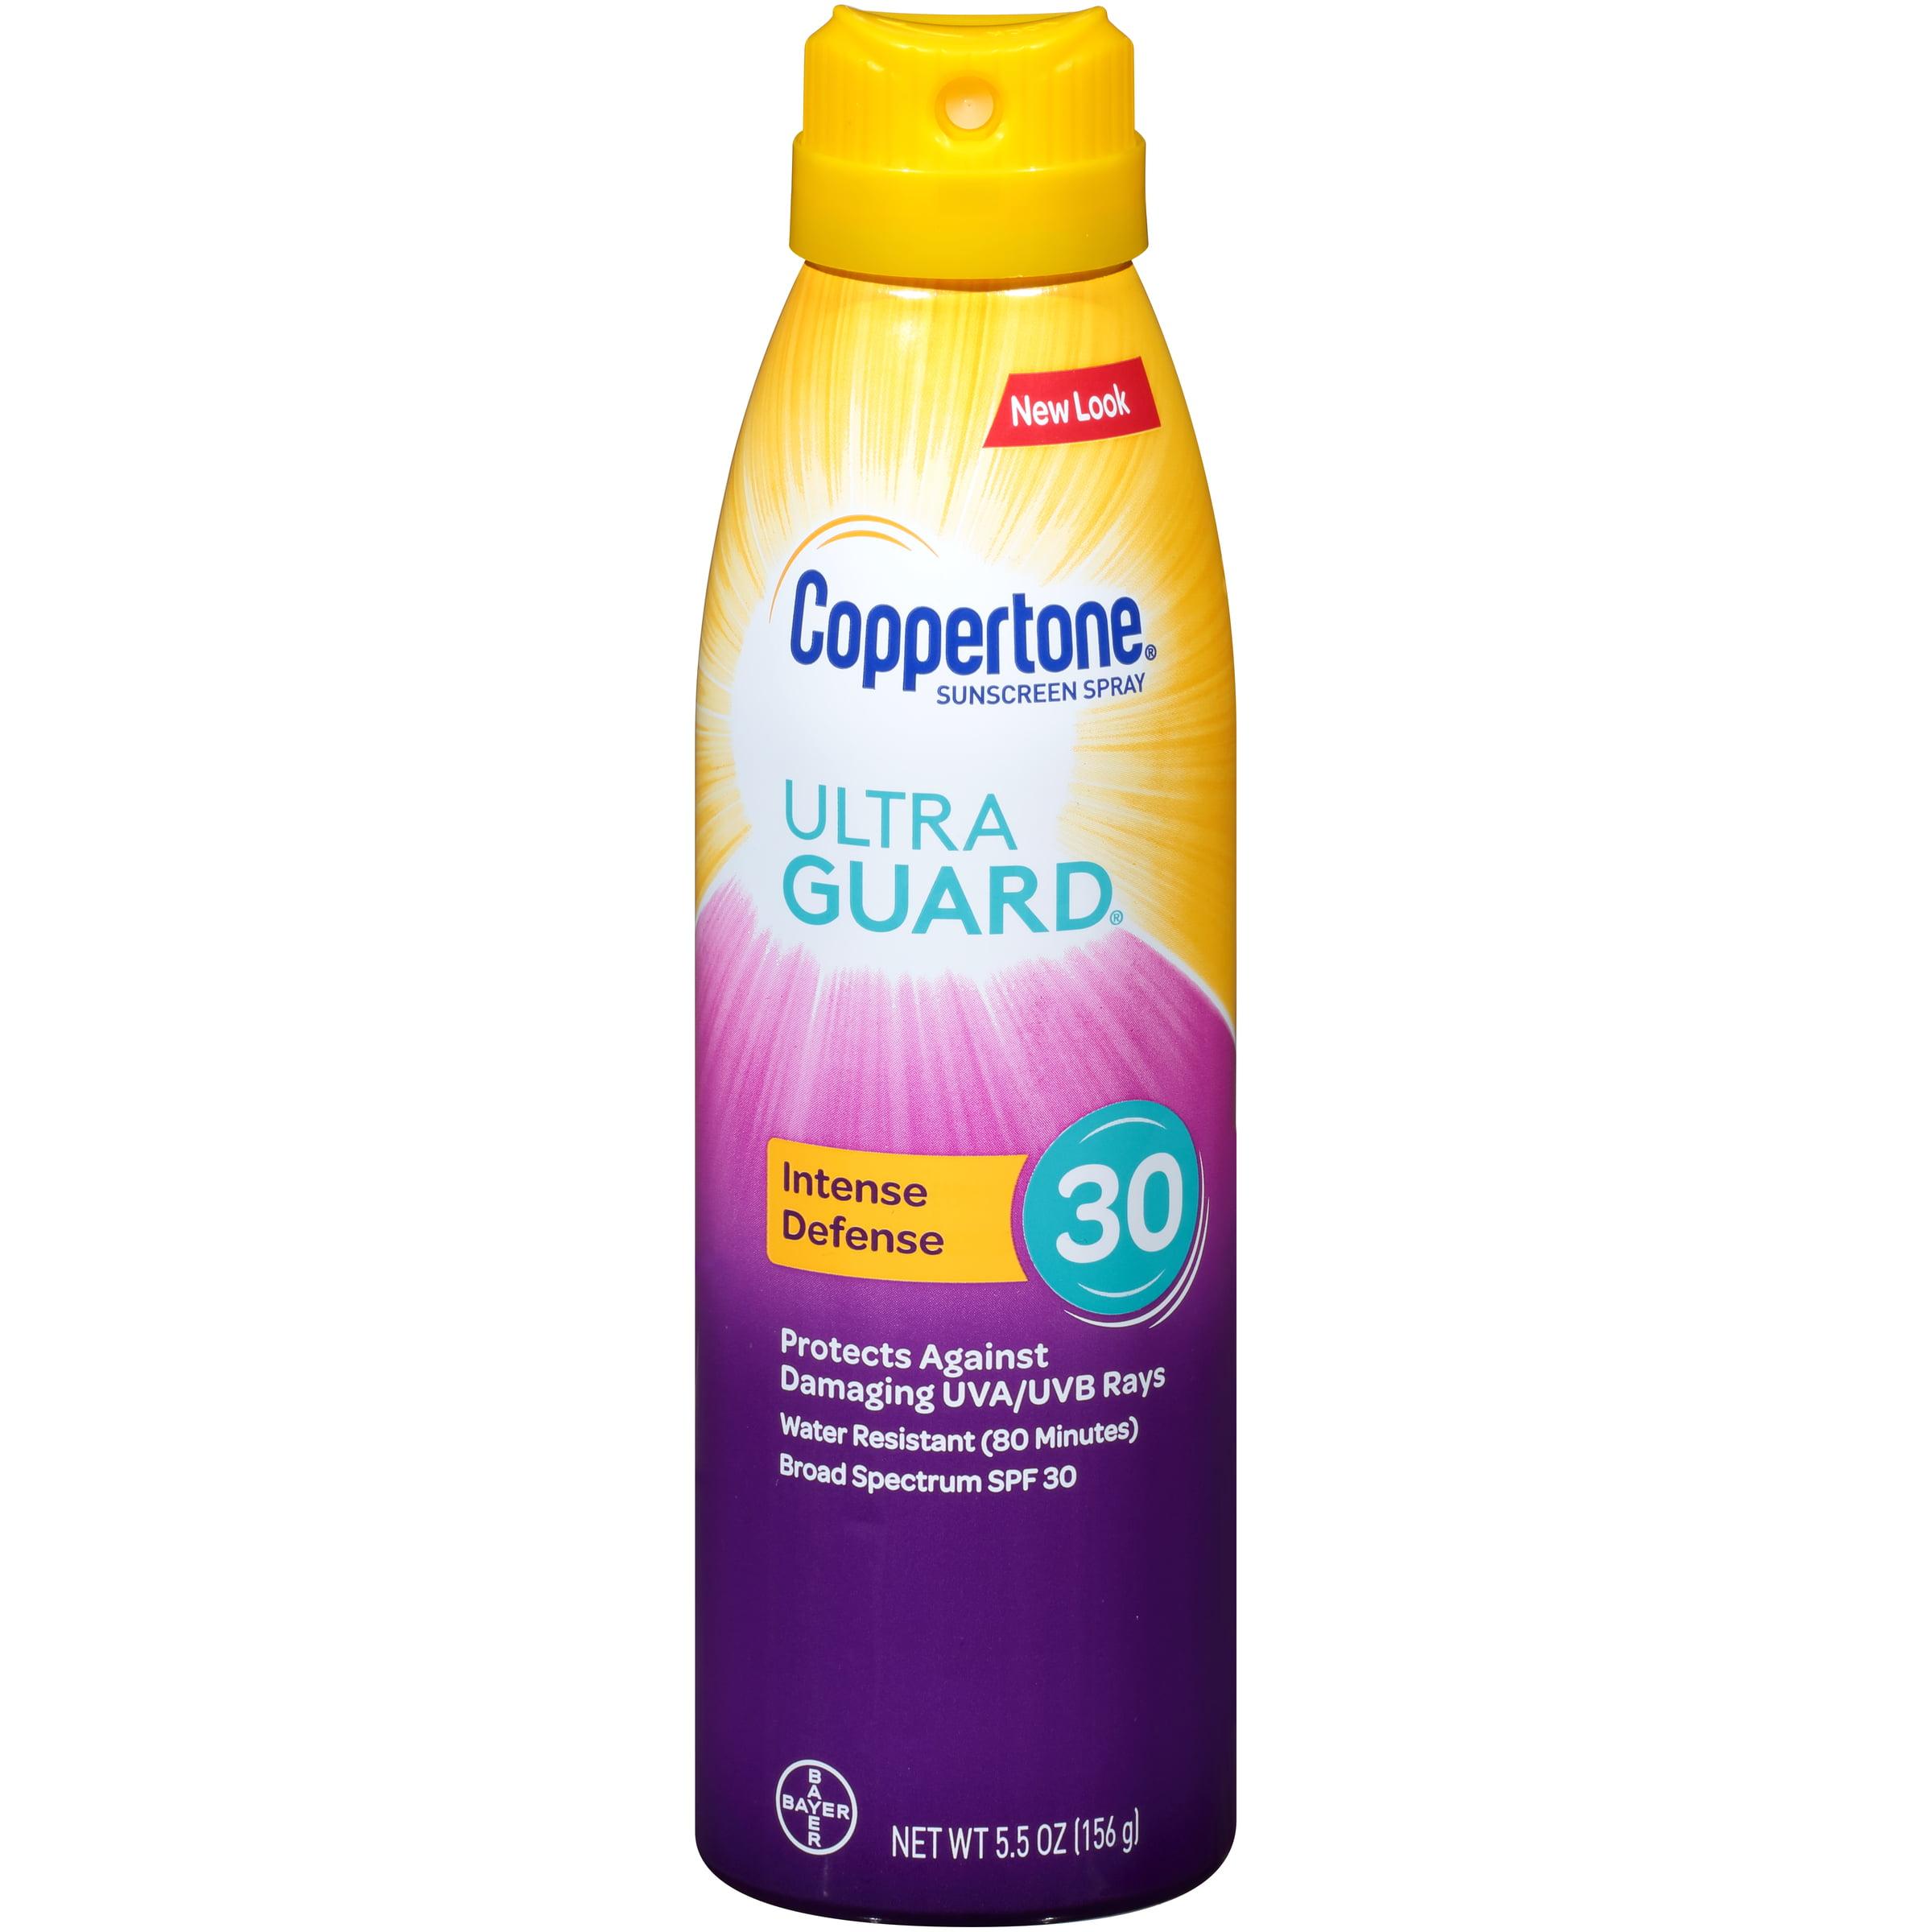 Coppertone Ultra Guard Sunscreen Continuous Spray SPF 30, 5.5 oz